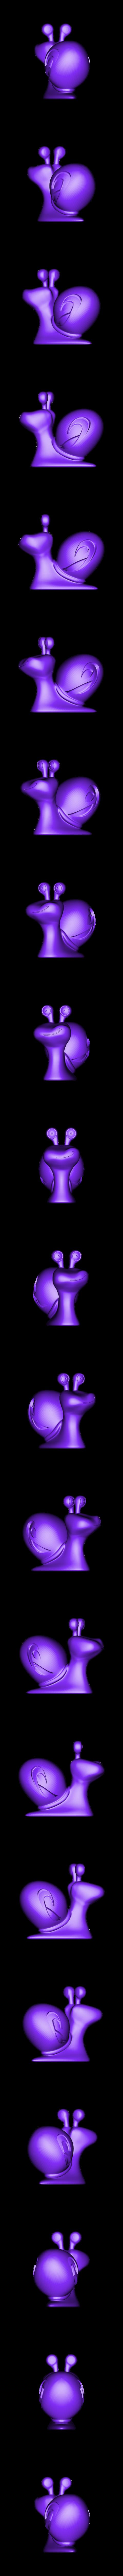 oscar.stl Download free STL file Oscar l'escargot  #STRATOMAKER  • 3D print object, rossanaafeltra